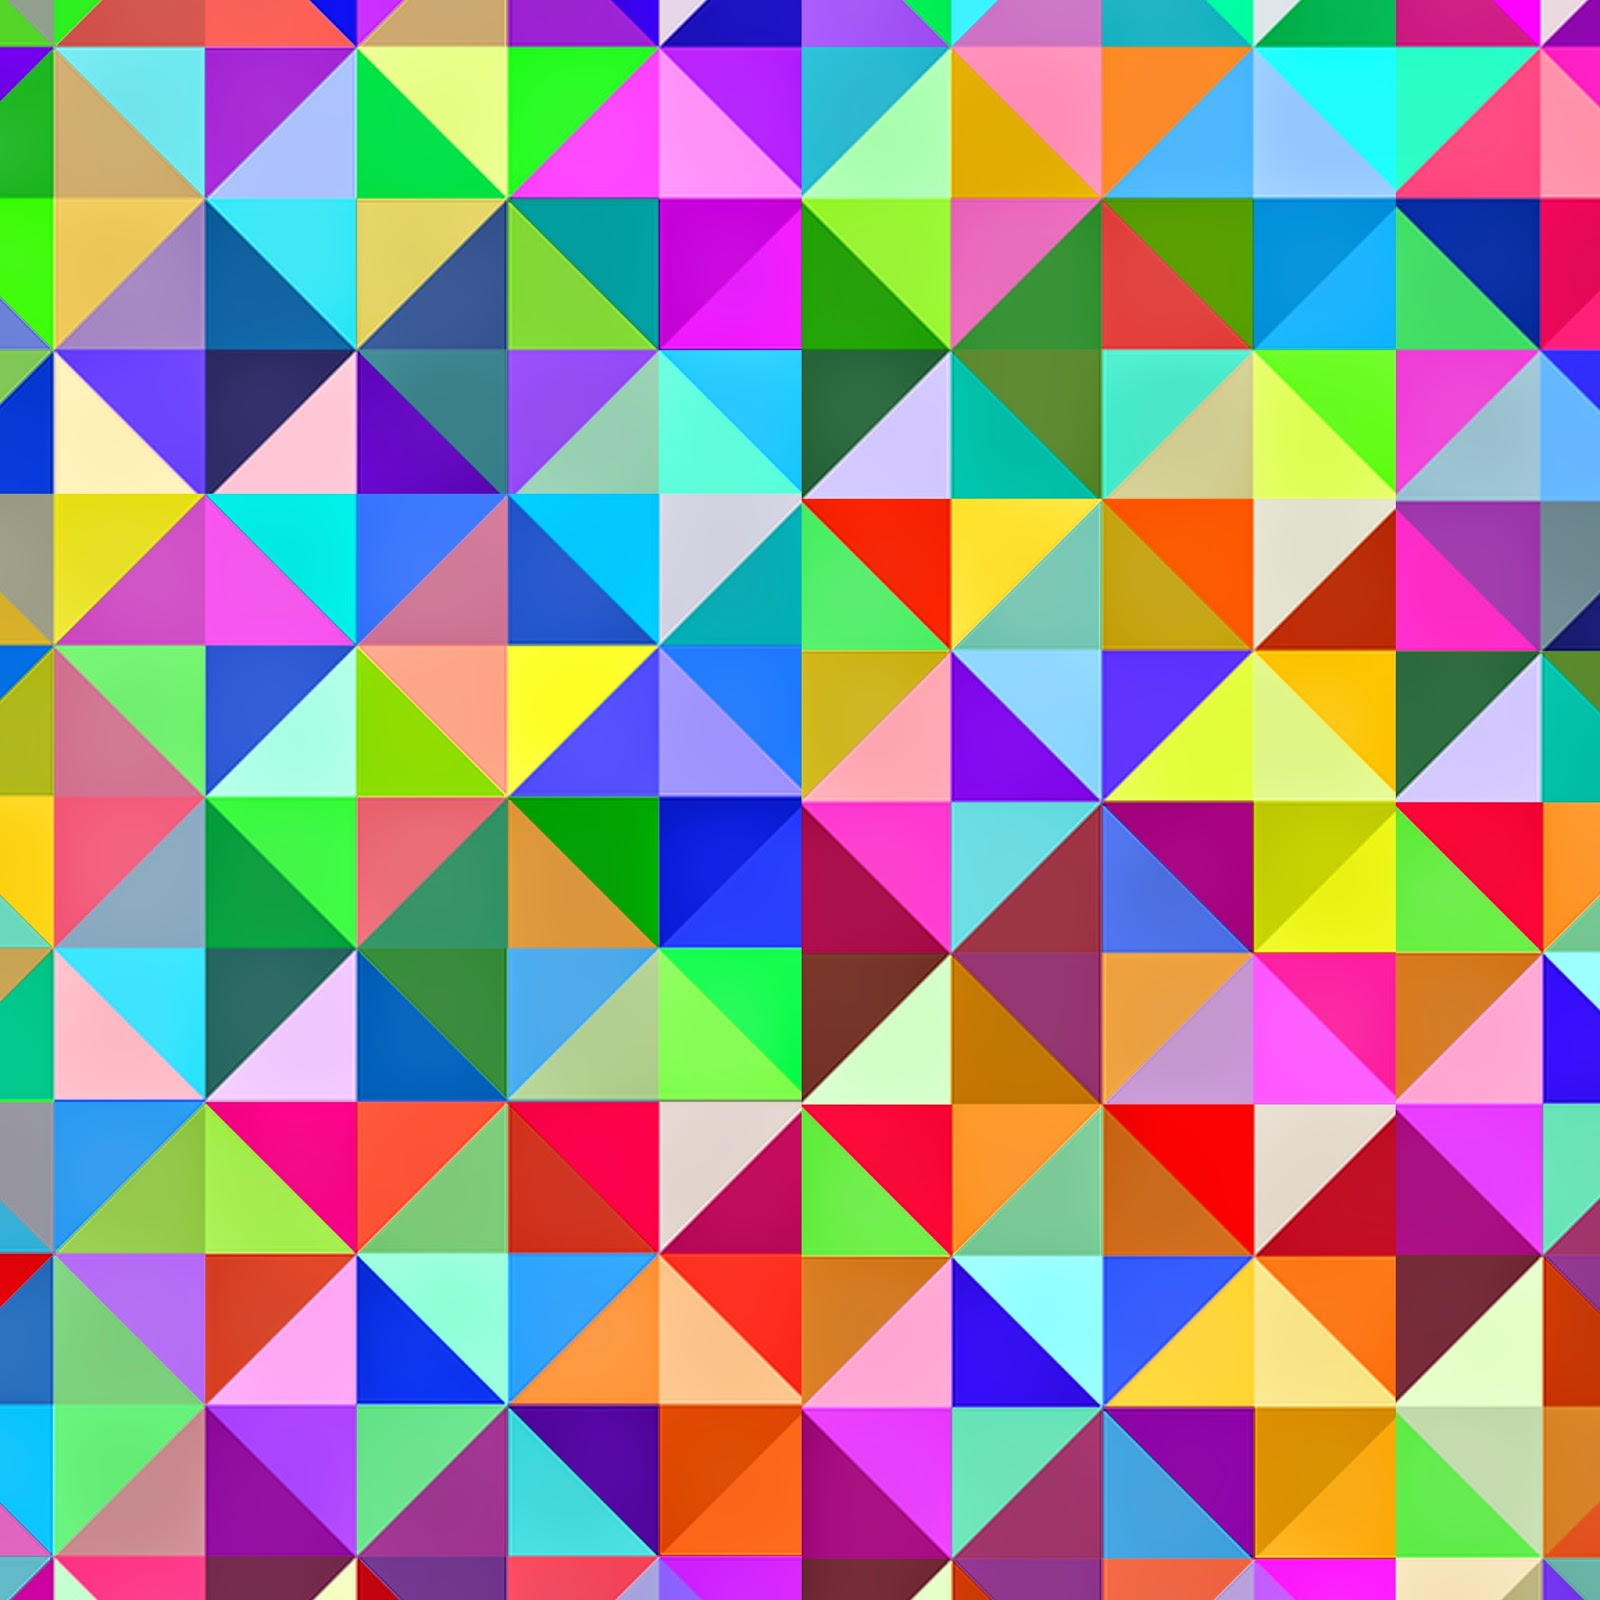 http://1.bp.blogspot.com/-dzb2JJHxHLs/Uz1jCnBksOI/AAAAAAAAmBc/BlnradX2dzc/s1600/giant+triangle+geometric+freebie+1.jpg